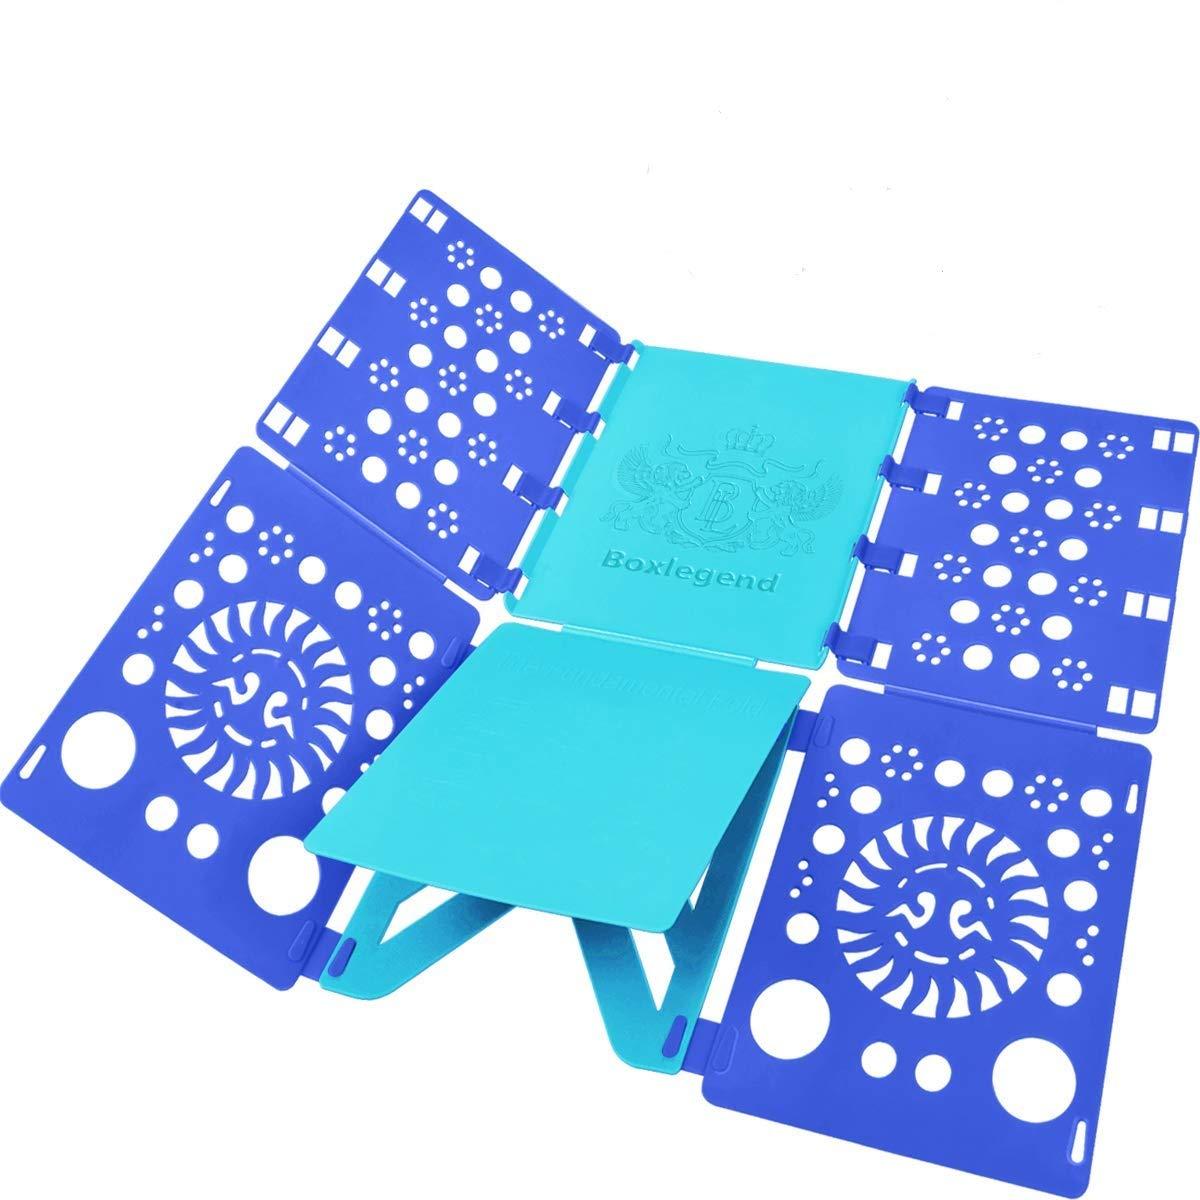 BoxLegend Folding Clothes Durable flipfold